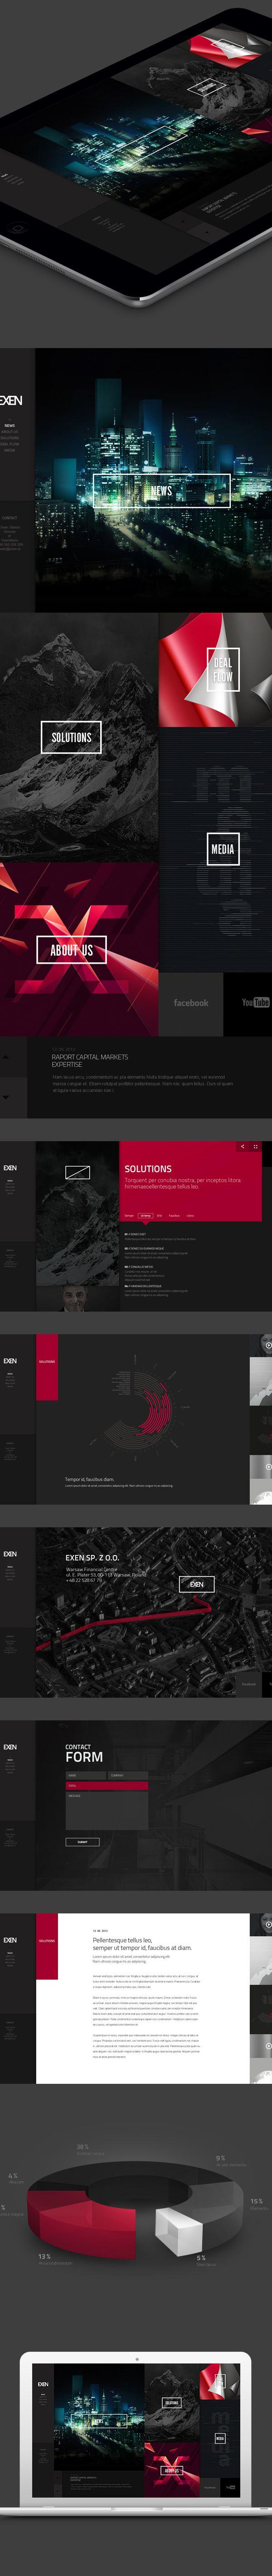 Exen website